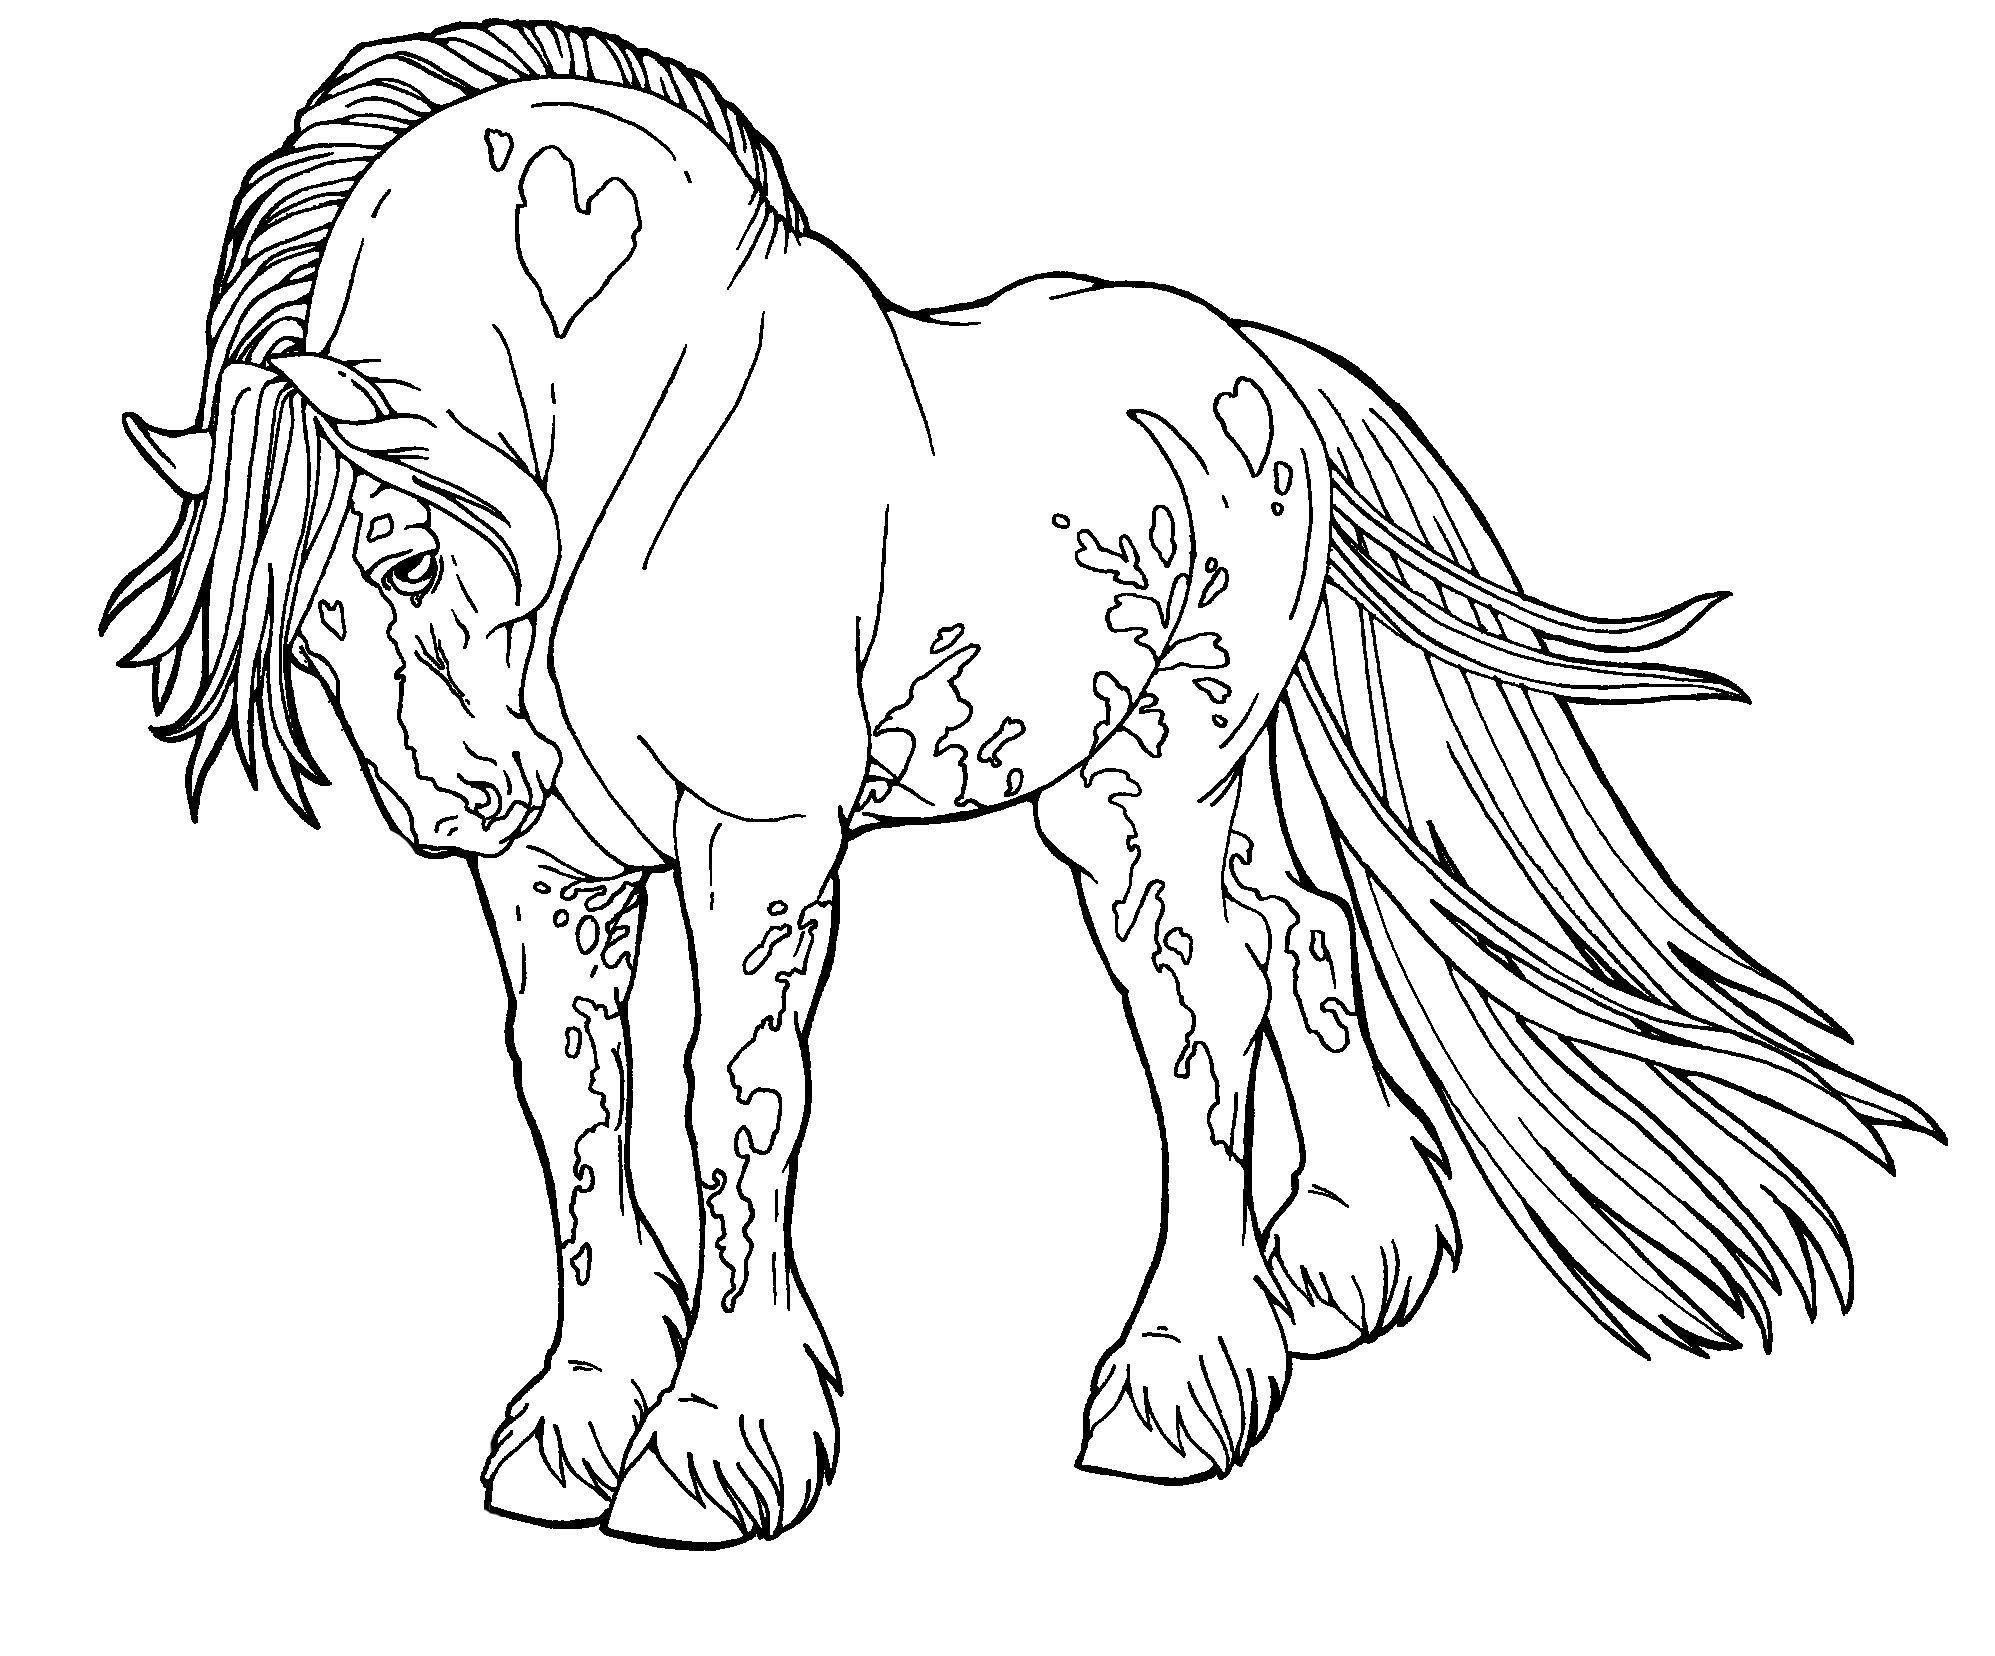 Coloring Printableg Pages Of Horses Baby Horse Sheets For Jumping Head Spirit Printabl Ausmalbilder Pferde Zum Ausdrucken Malvorlagen Pferde Ausmalbilder Hunde